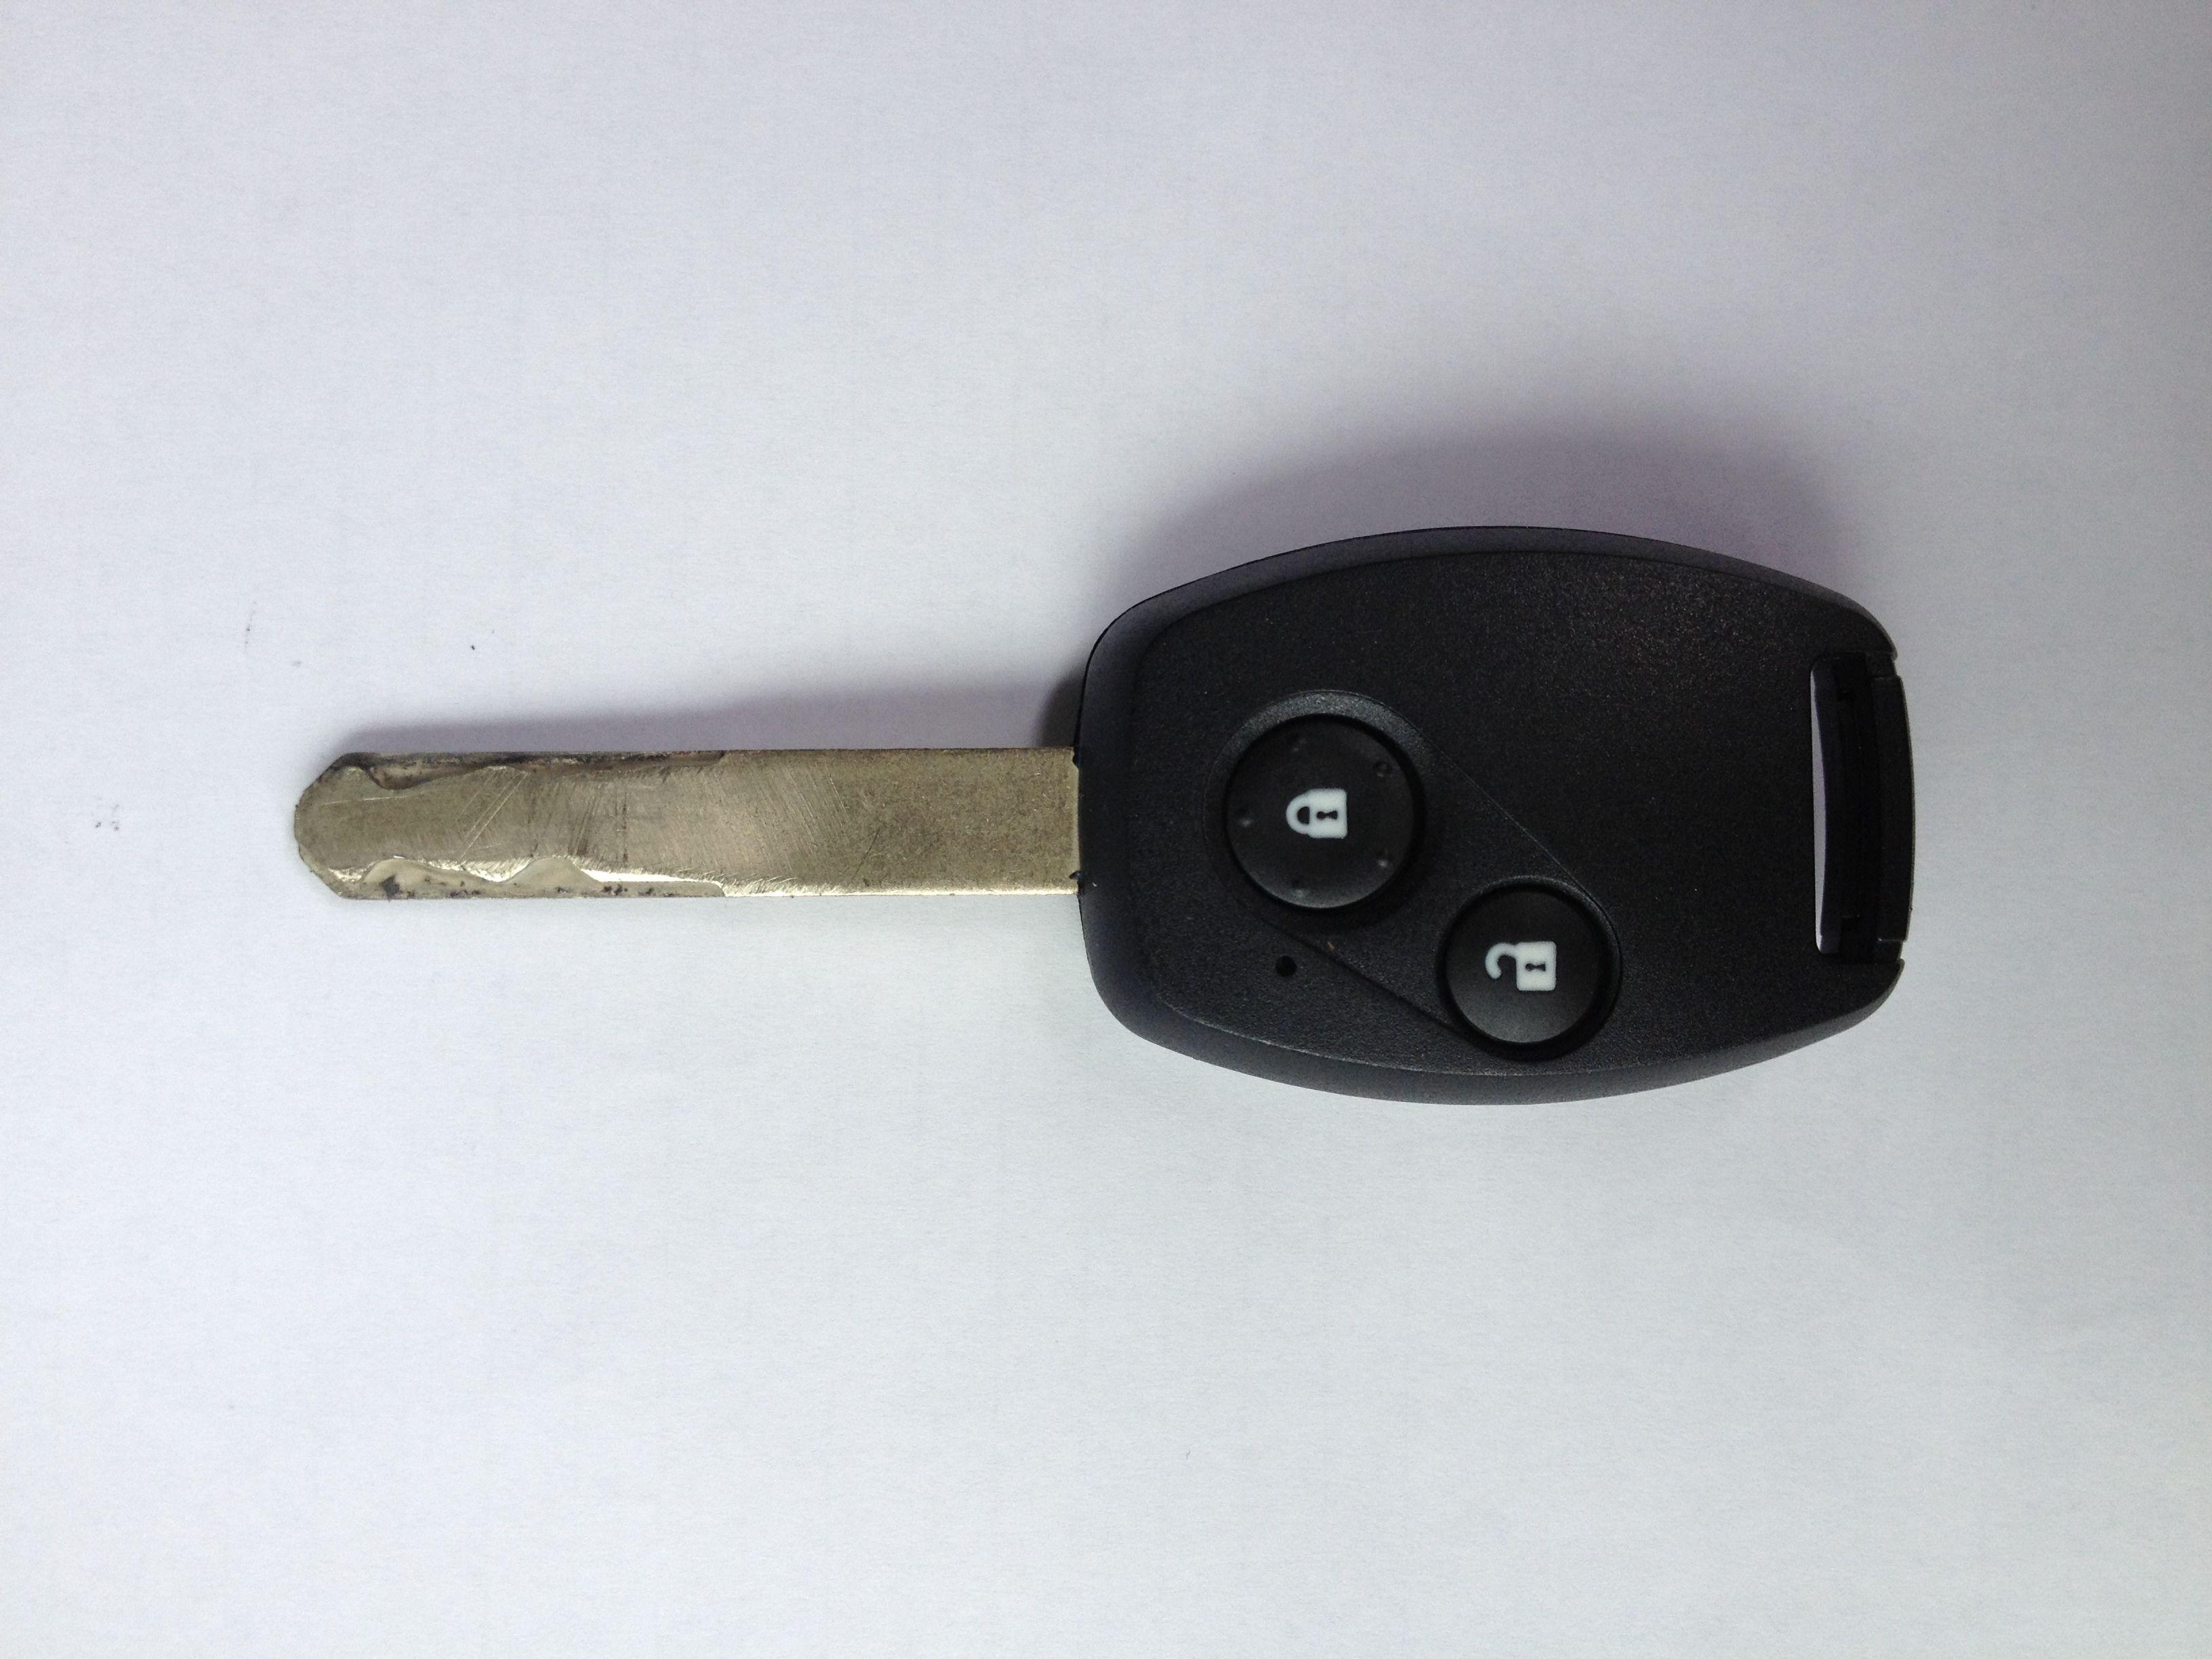 fob acura car honda key locksmith keys replacement lost flip supreme